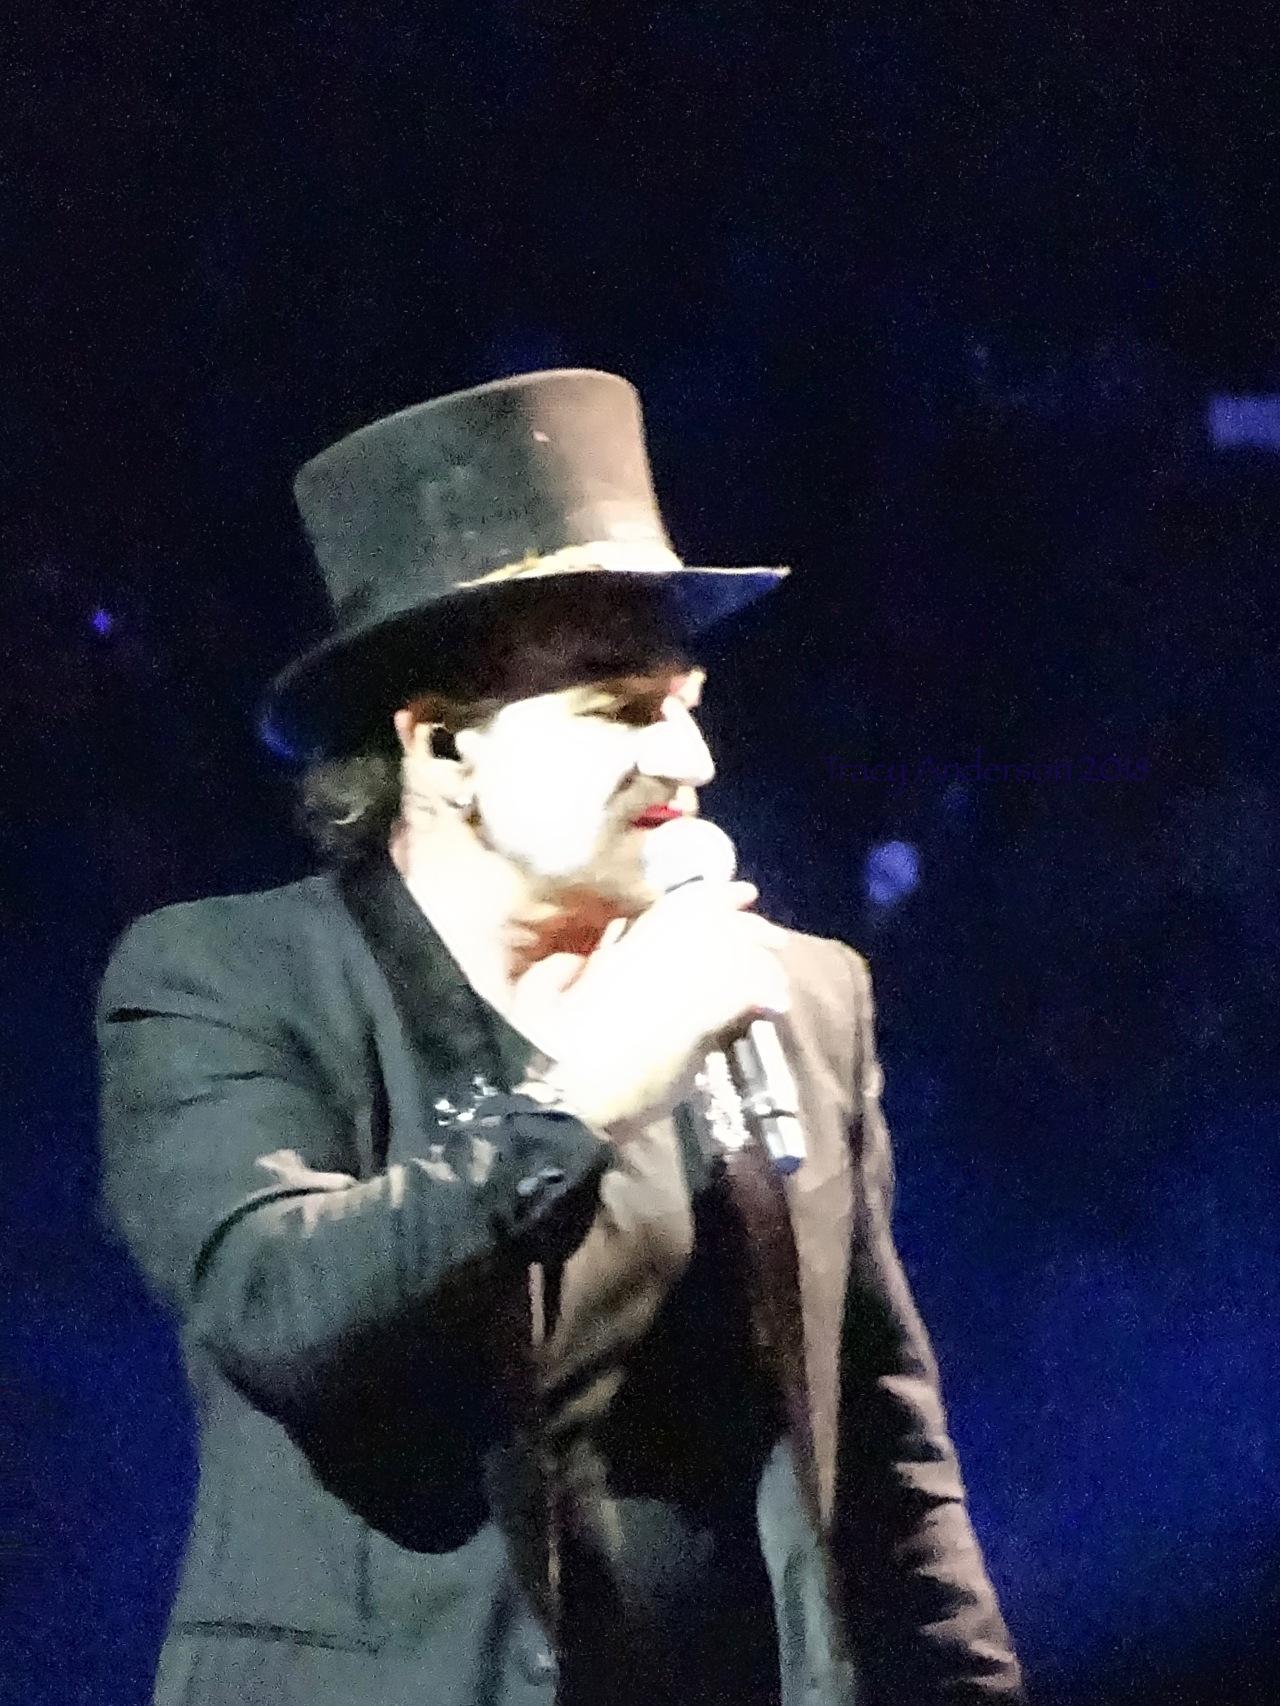 Bono Return of MacPhisto U2 eiTour Las Vegas May 11 2018